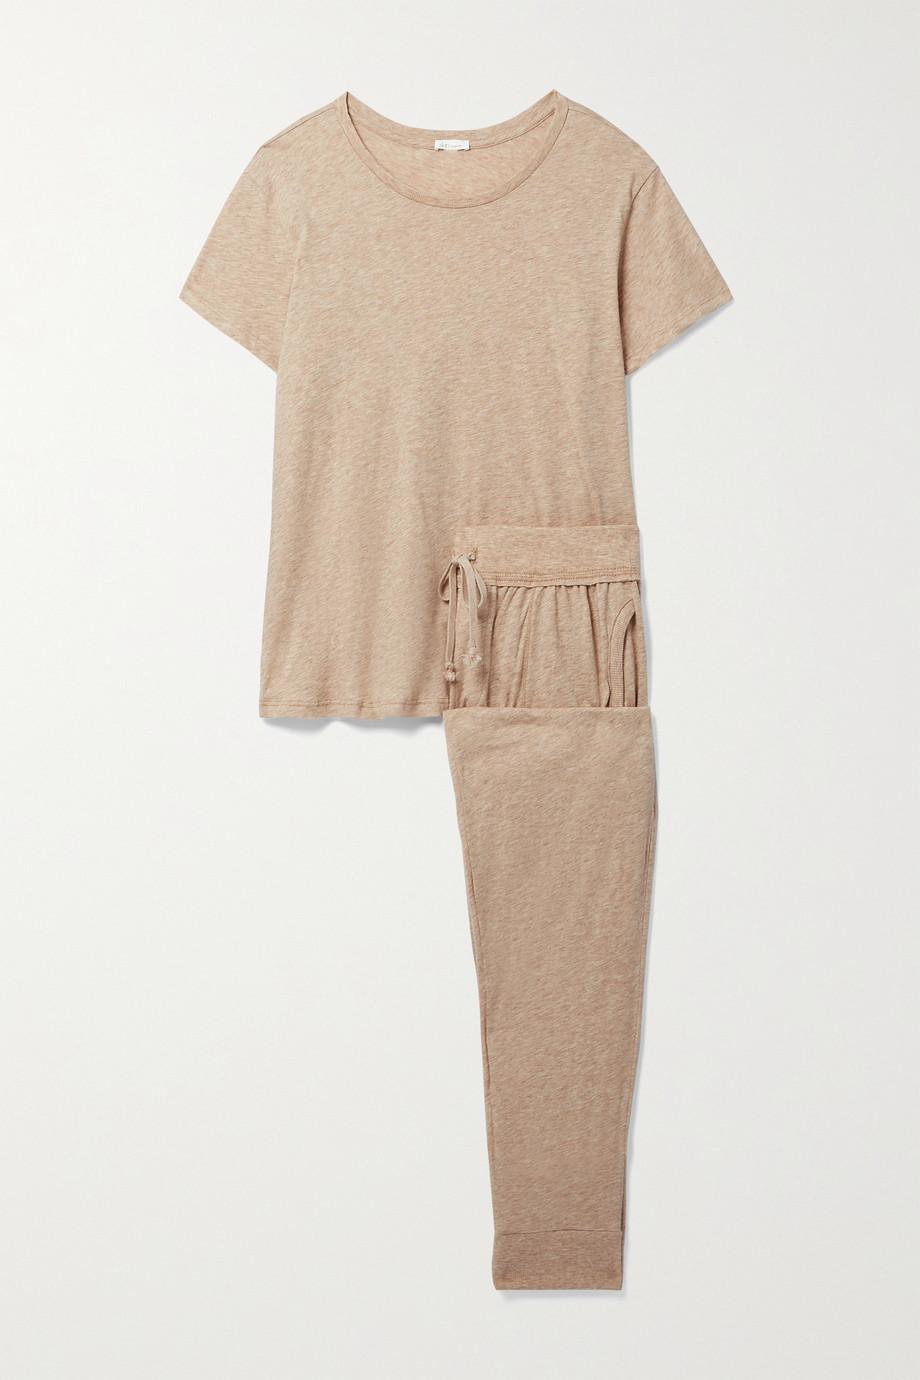 Skin + NET SUSTAIN Carleen Pyjama aus Bio-Pima-Baumwoll-Jersey